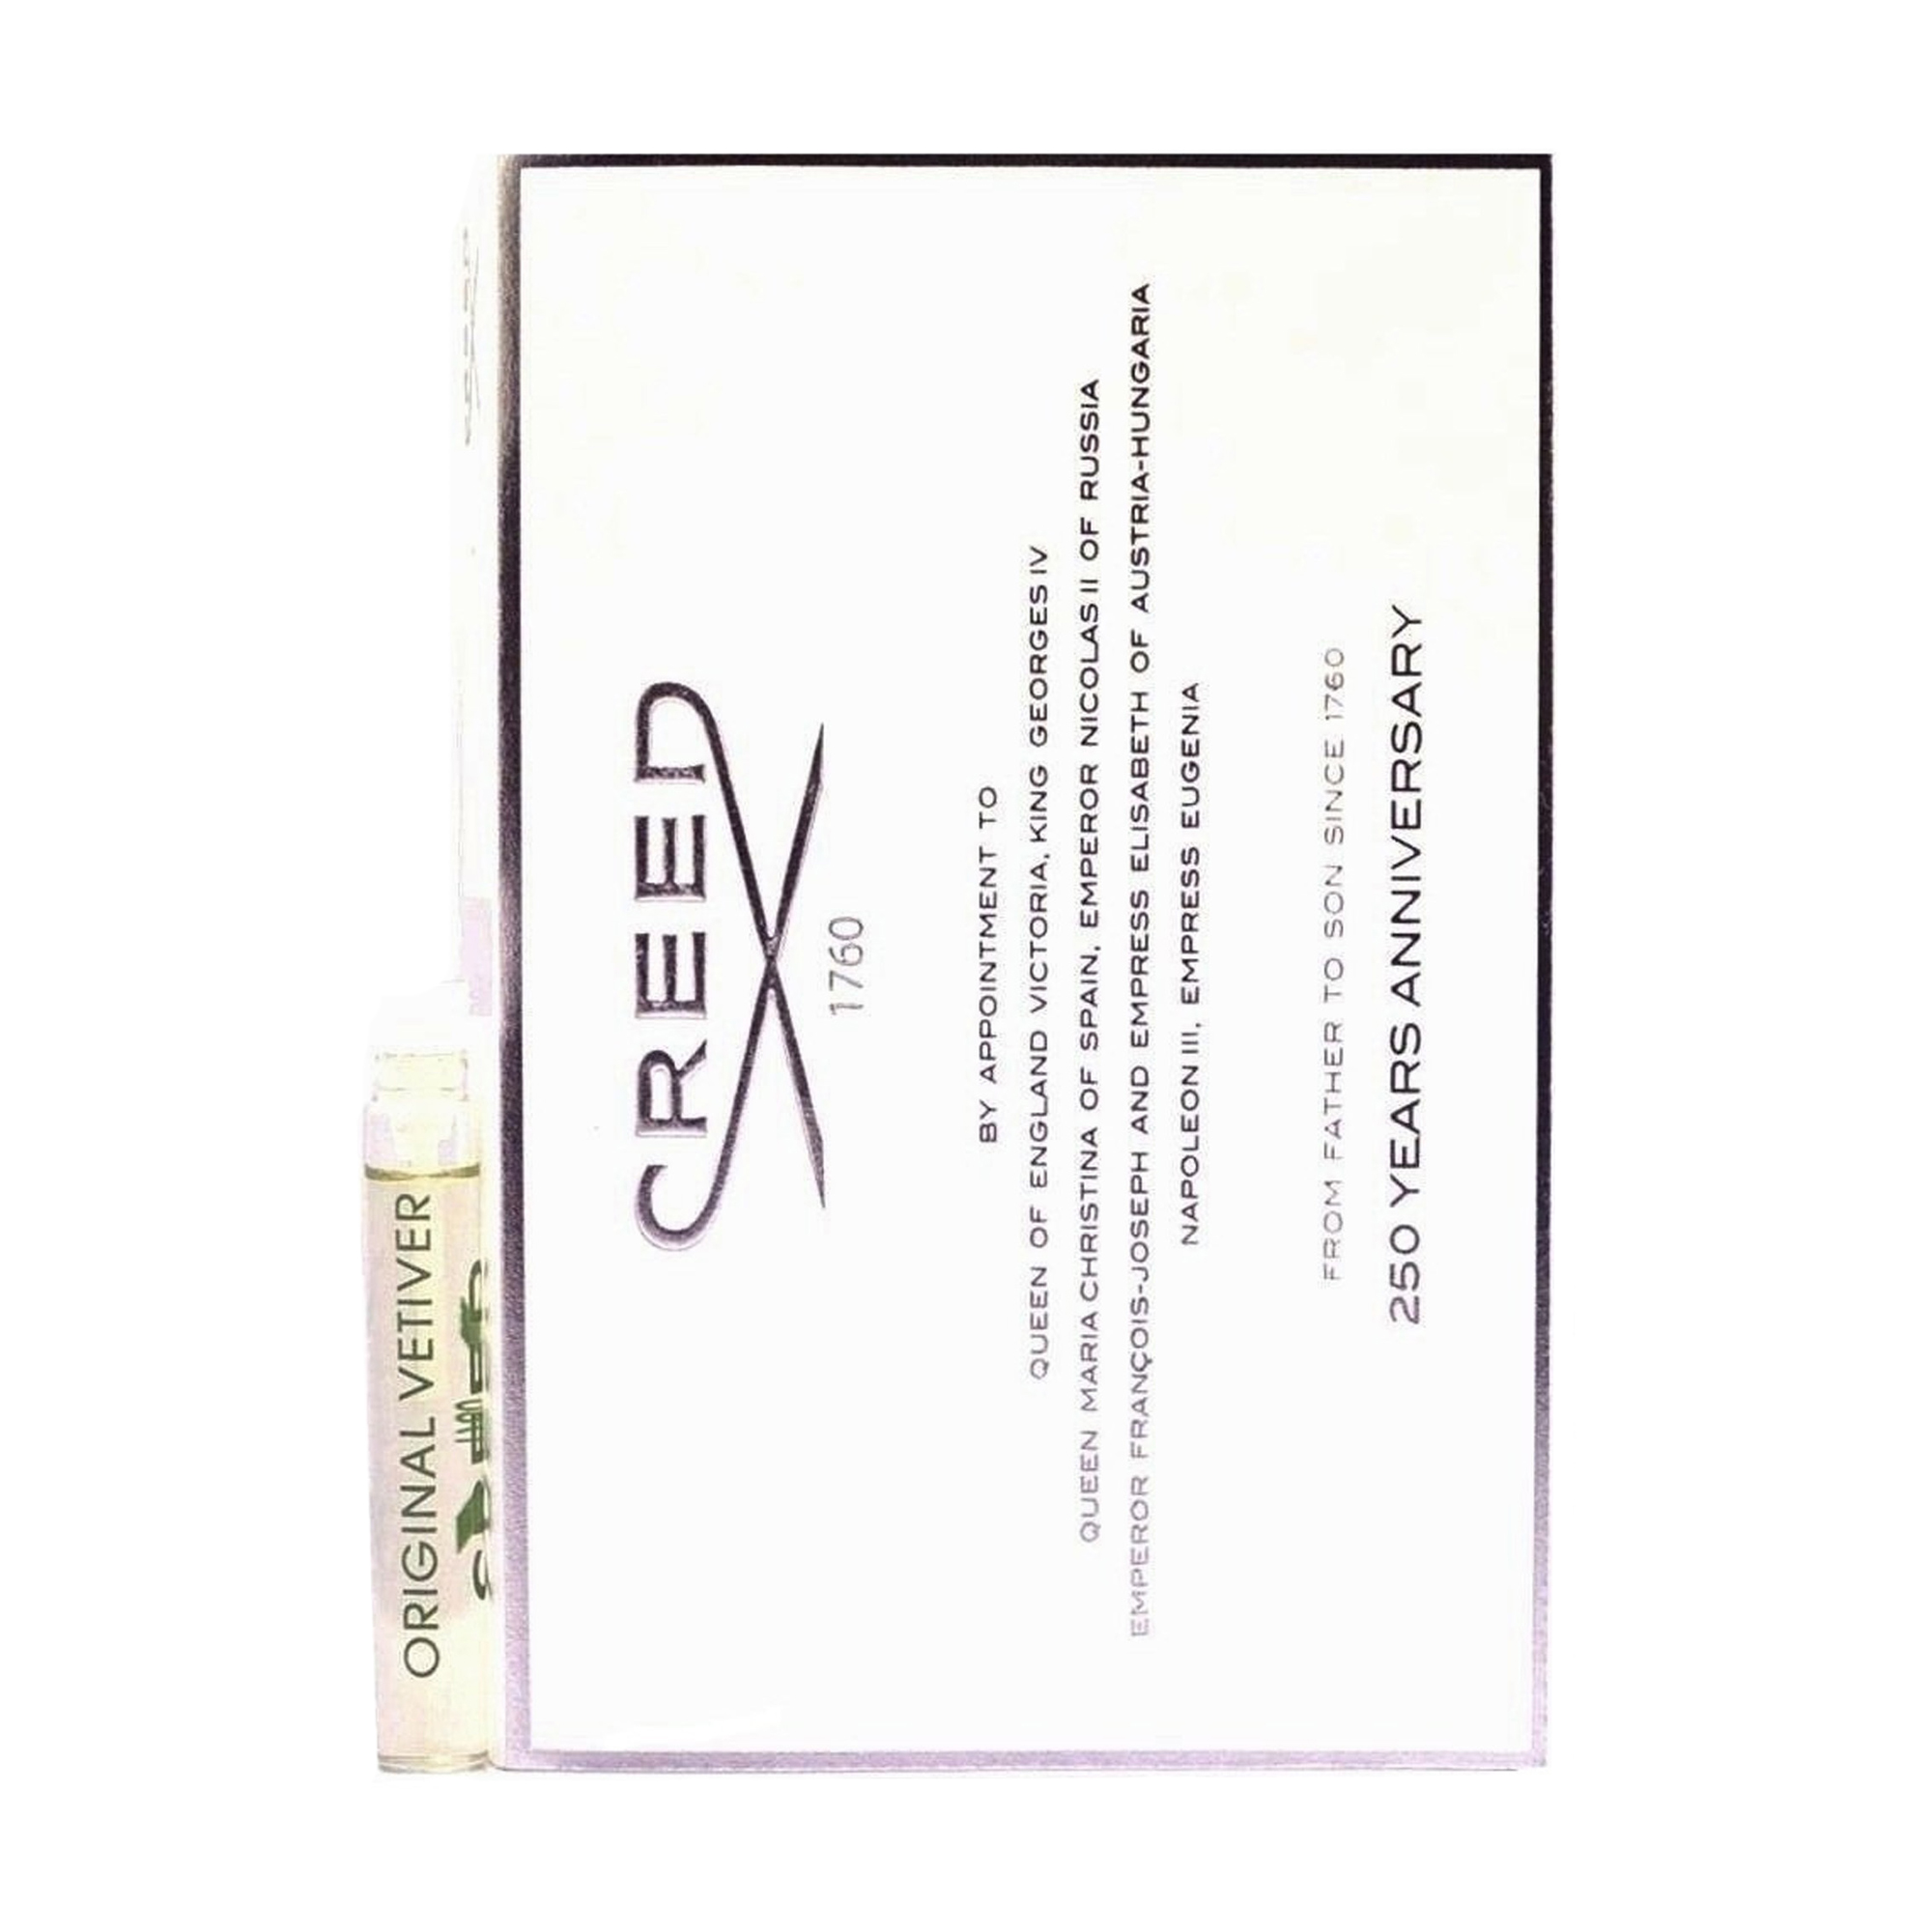 Купить Creed Millesime Original Vetiver парфюмированная вода мужская, 2, 5 мл